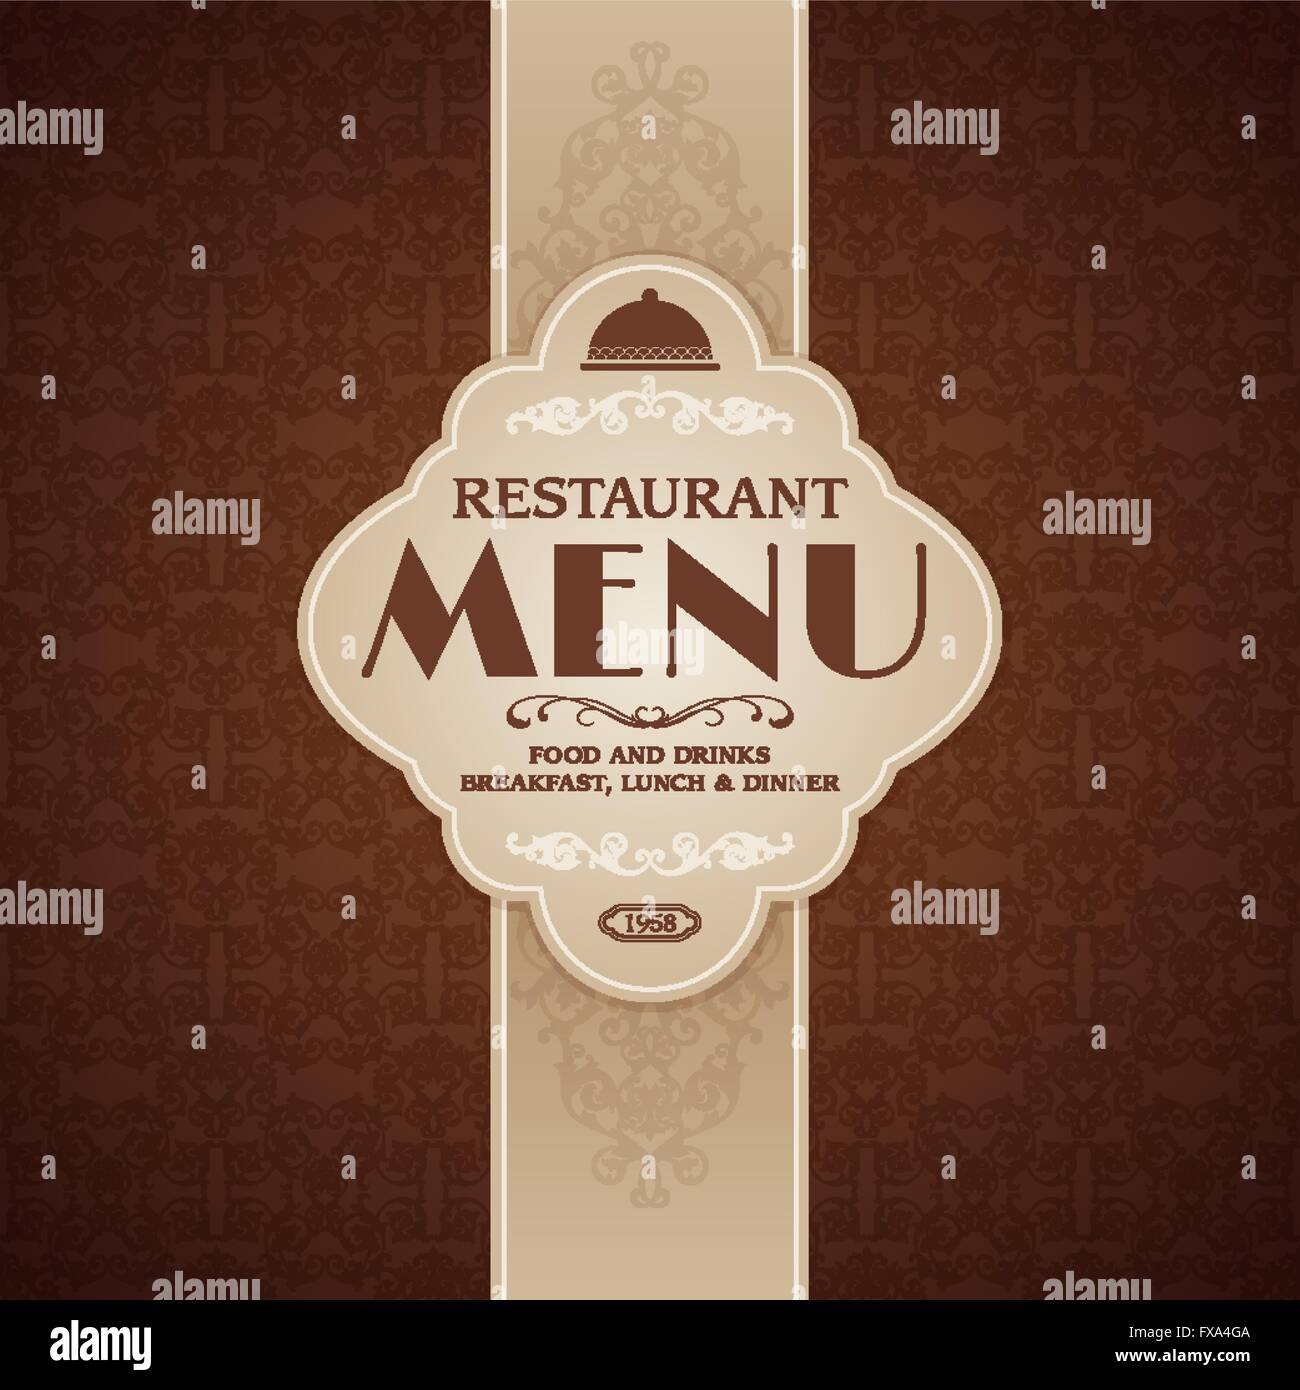 Restaurant Cafe Menu Brochure Template Stock Vector Art - Menu brochure template